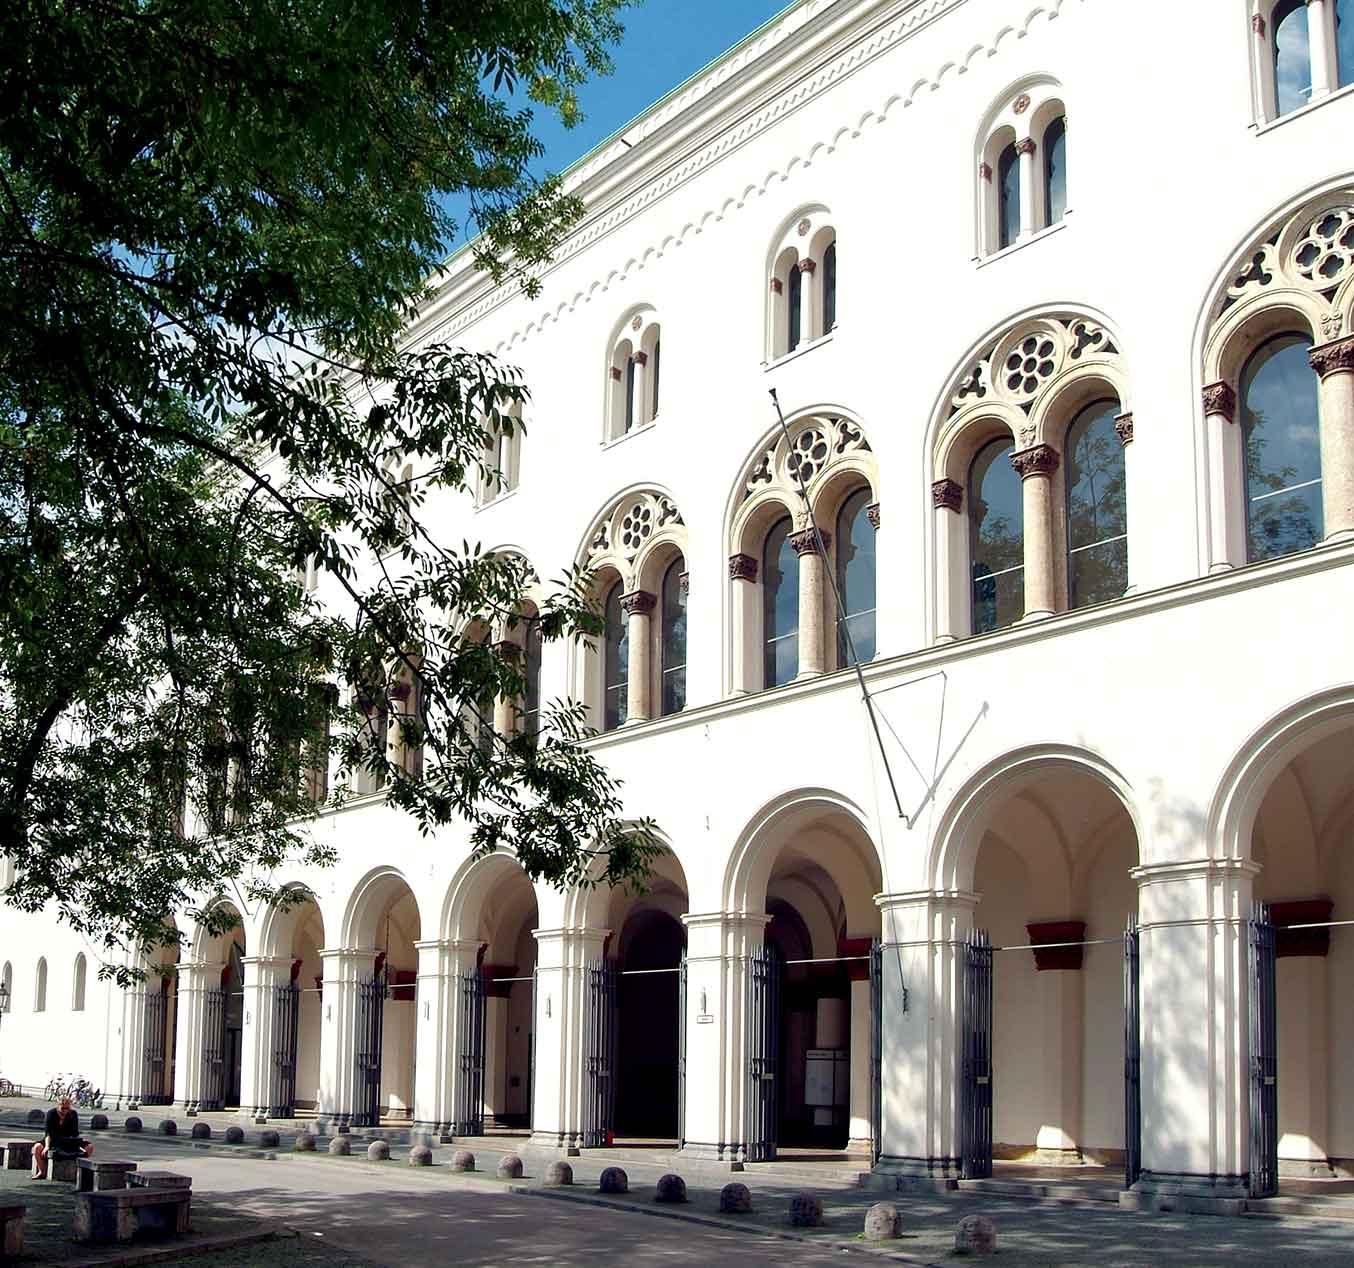 Ludwig-Maximilians-Universität München (Germany)